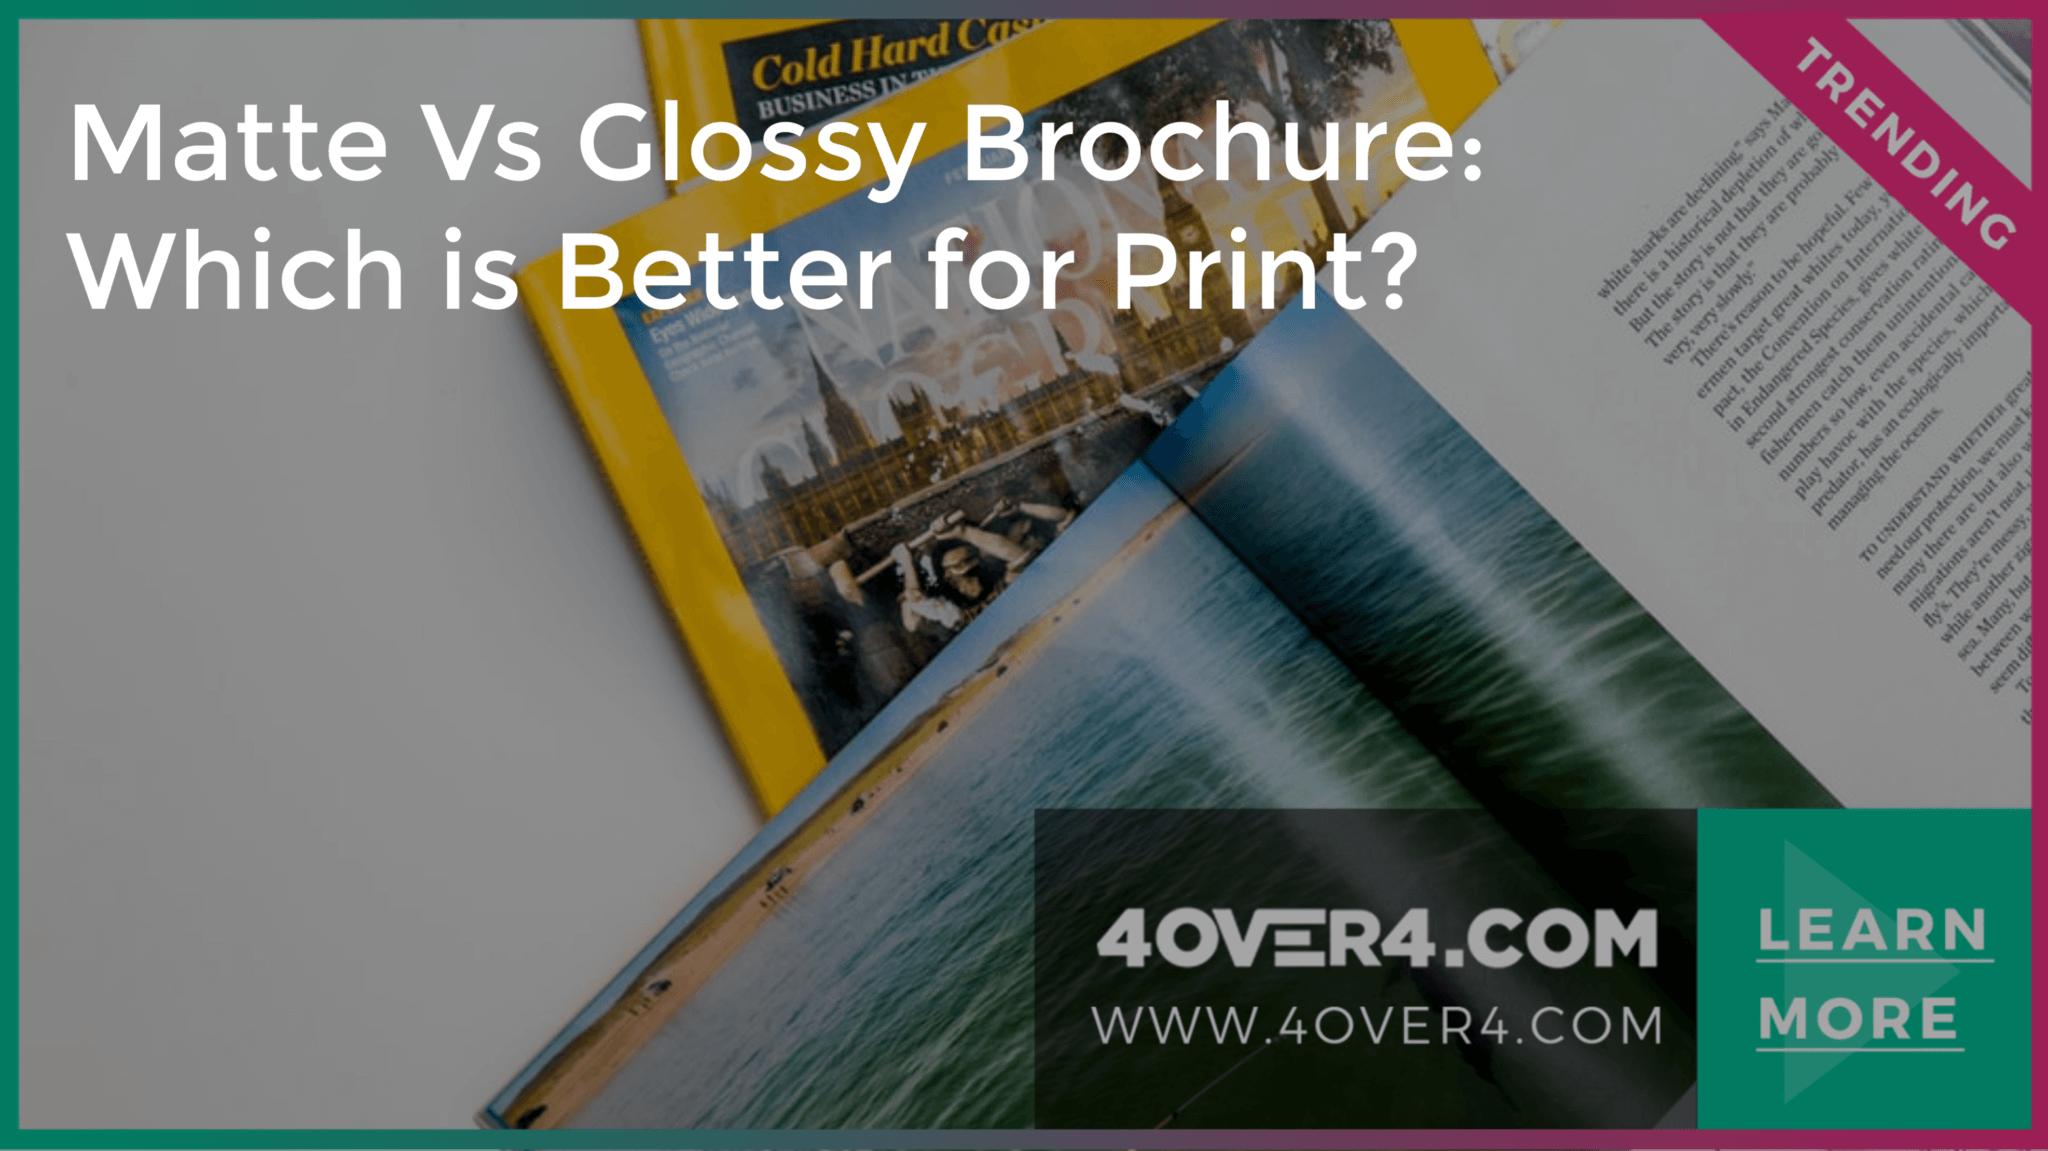 Matte Vs Glossy Brochure: Which is Better for Print? - Branding